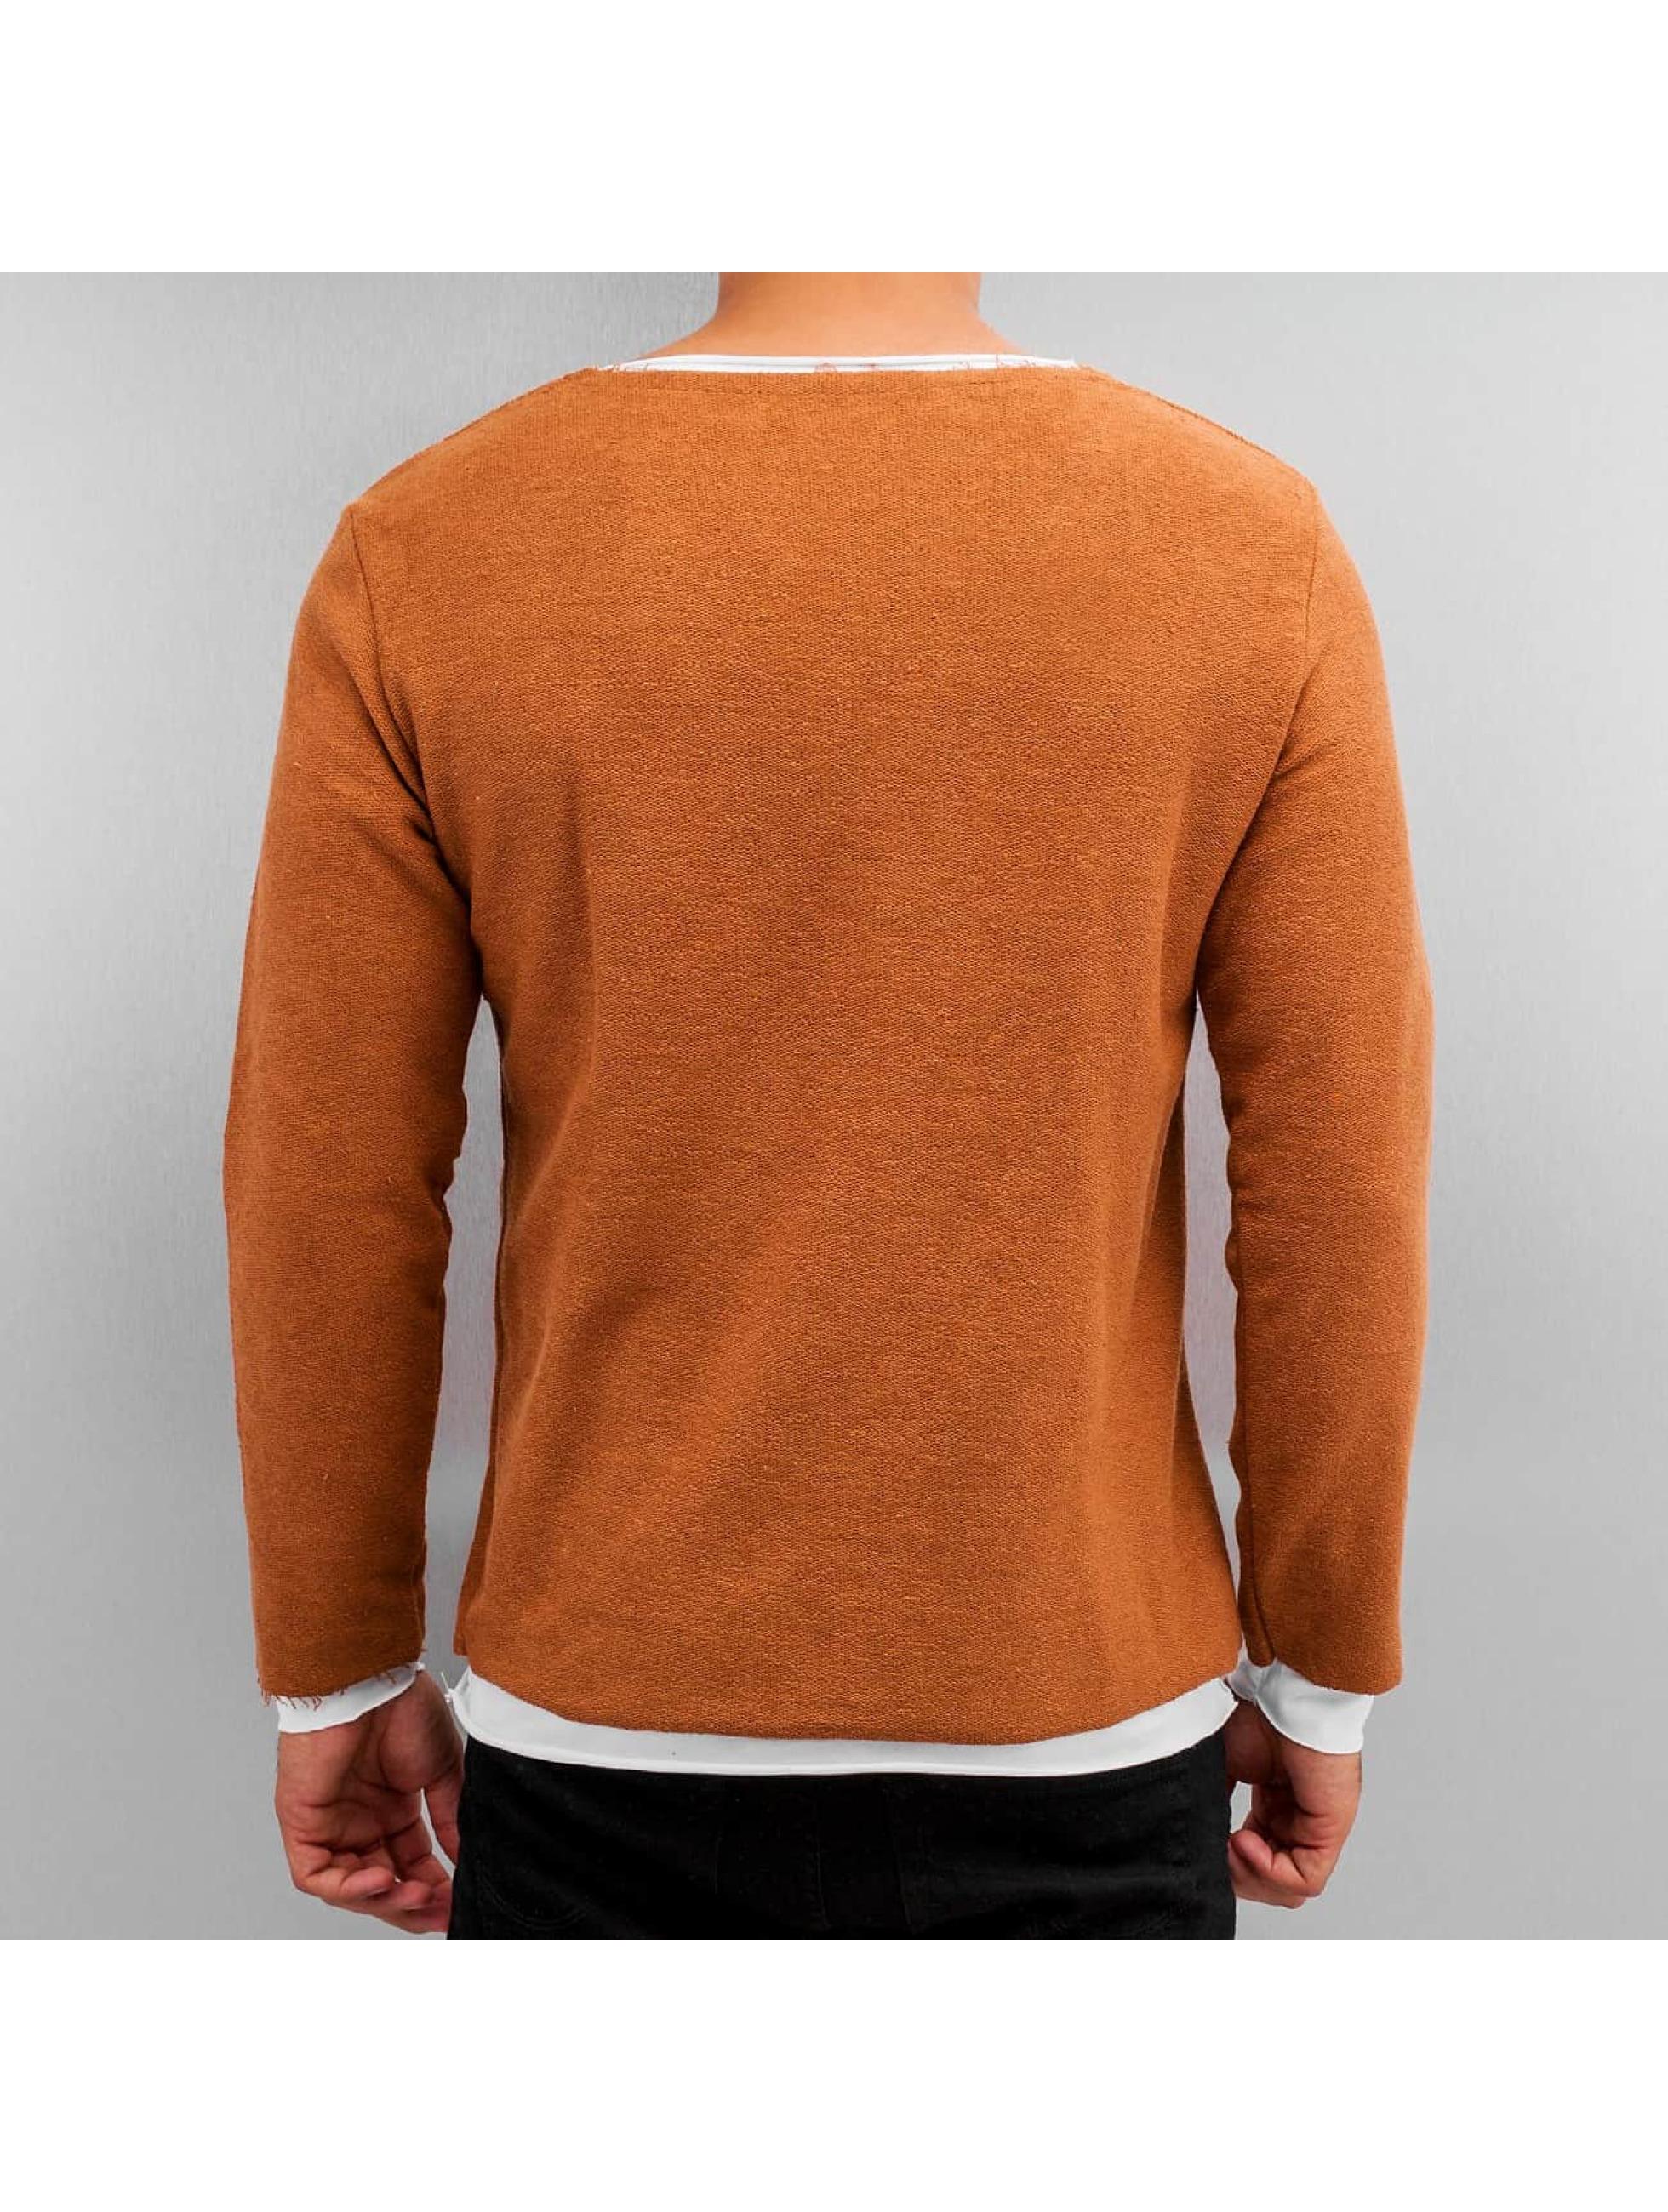 2Y T-Shirt manches longues Pett orange